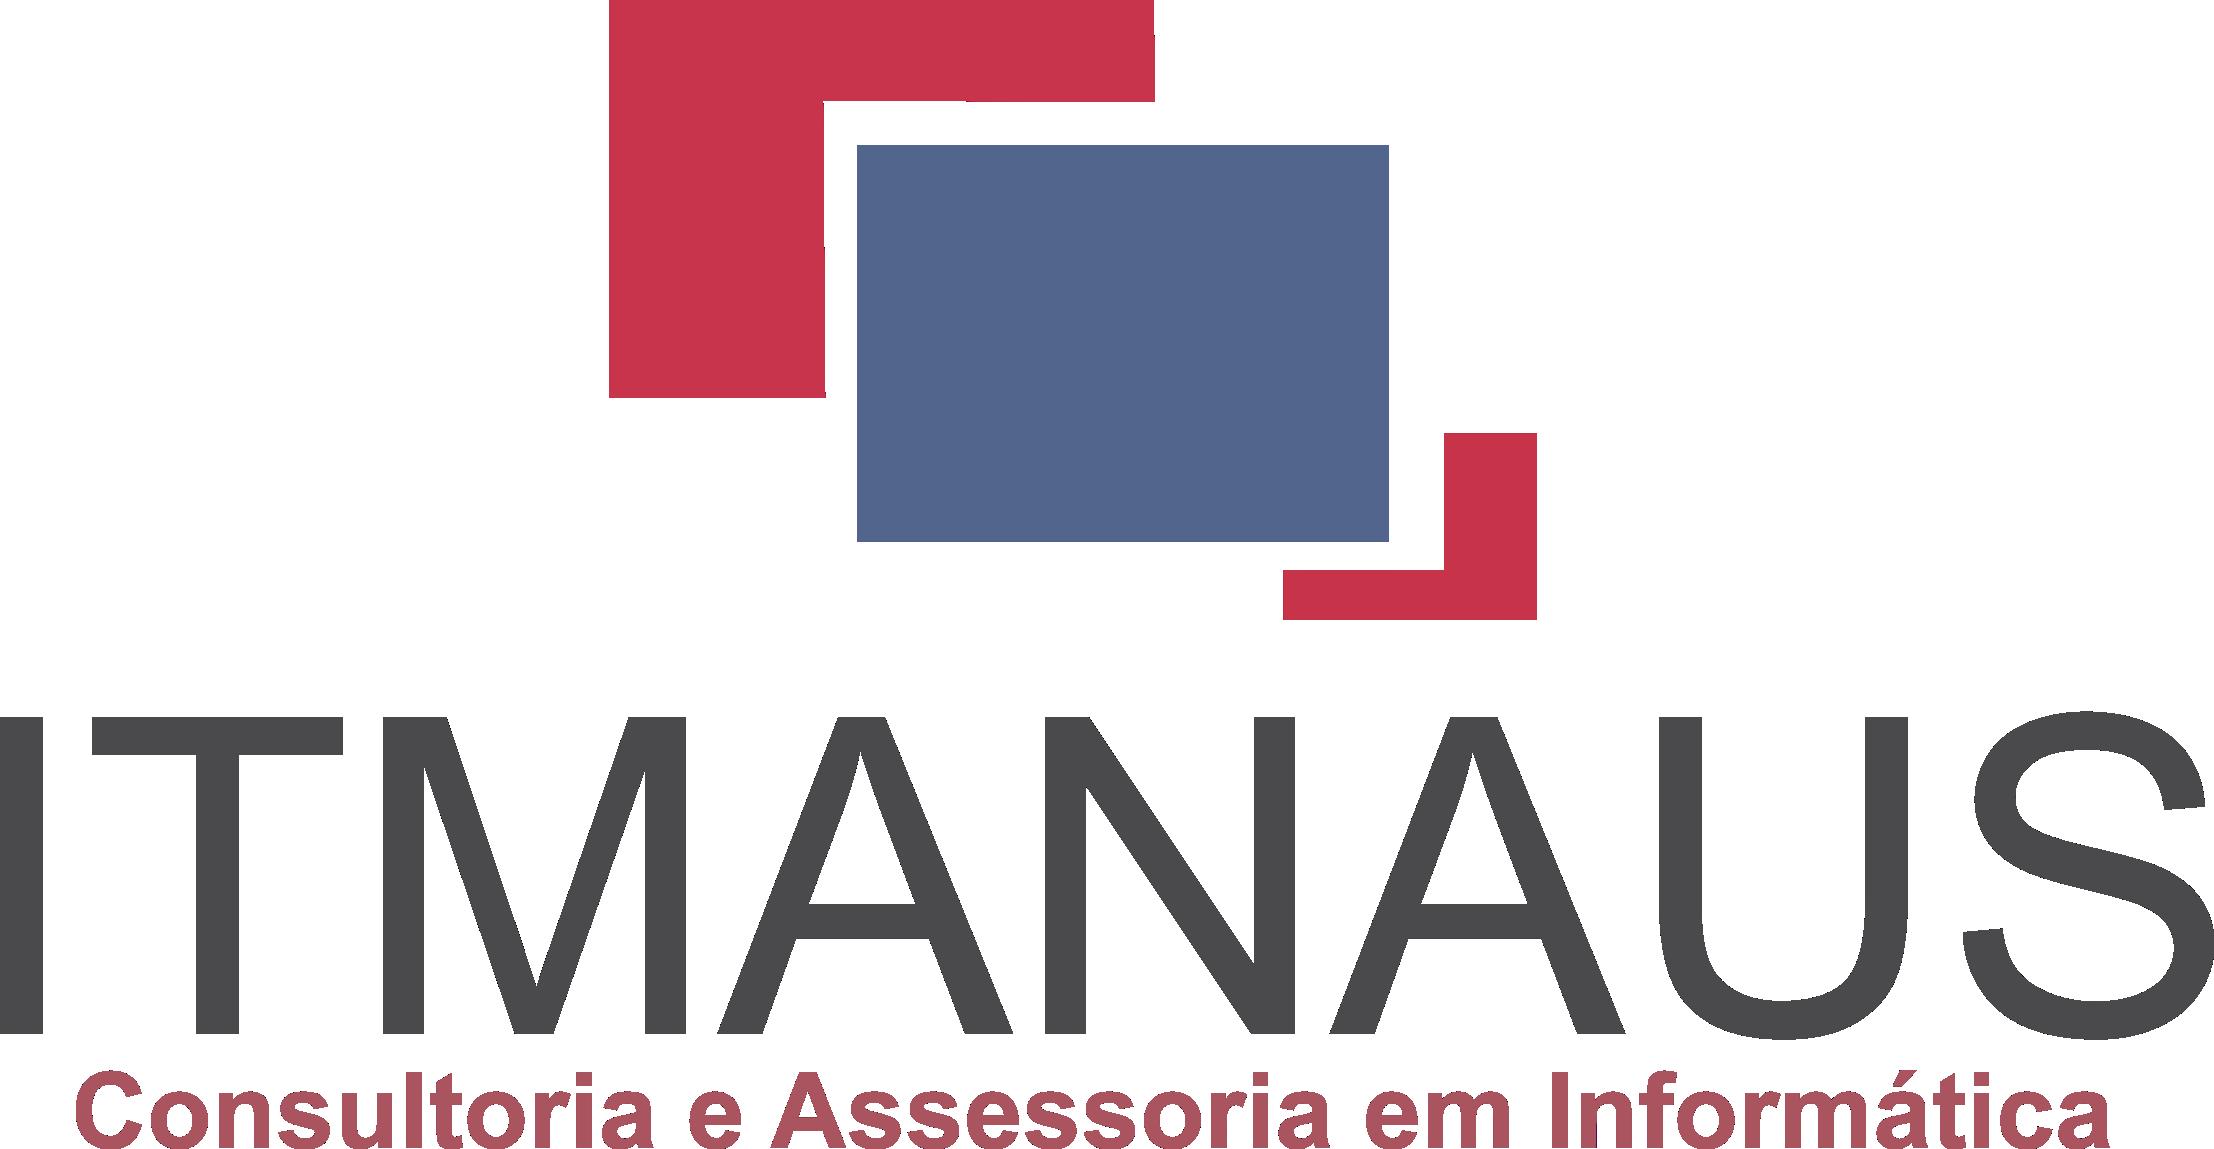 Itmanaus - Consultoria e Assessoria de Informatica